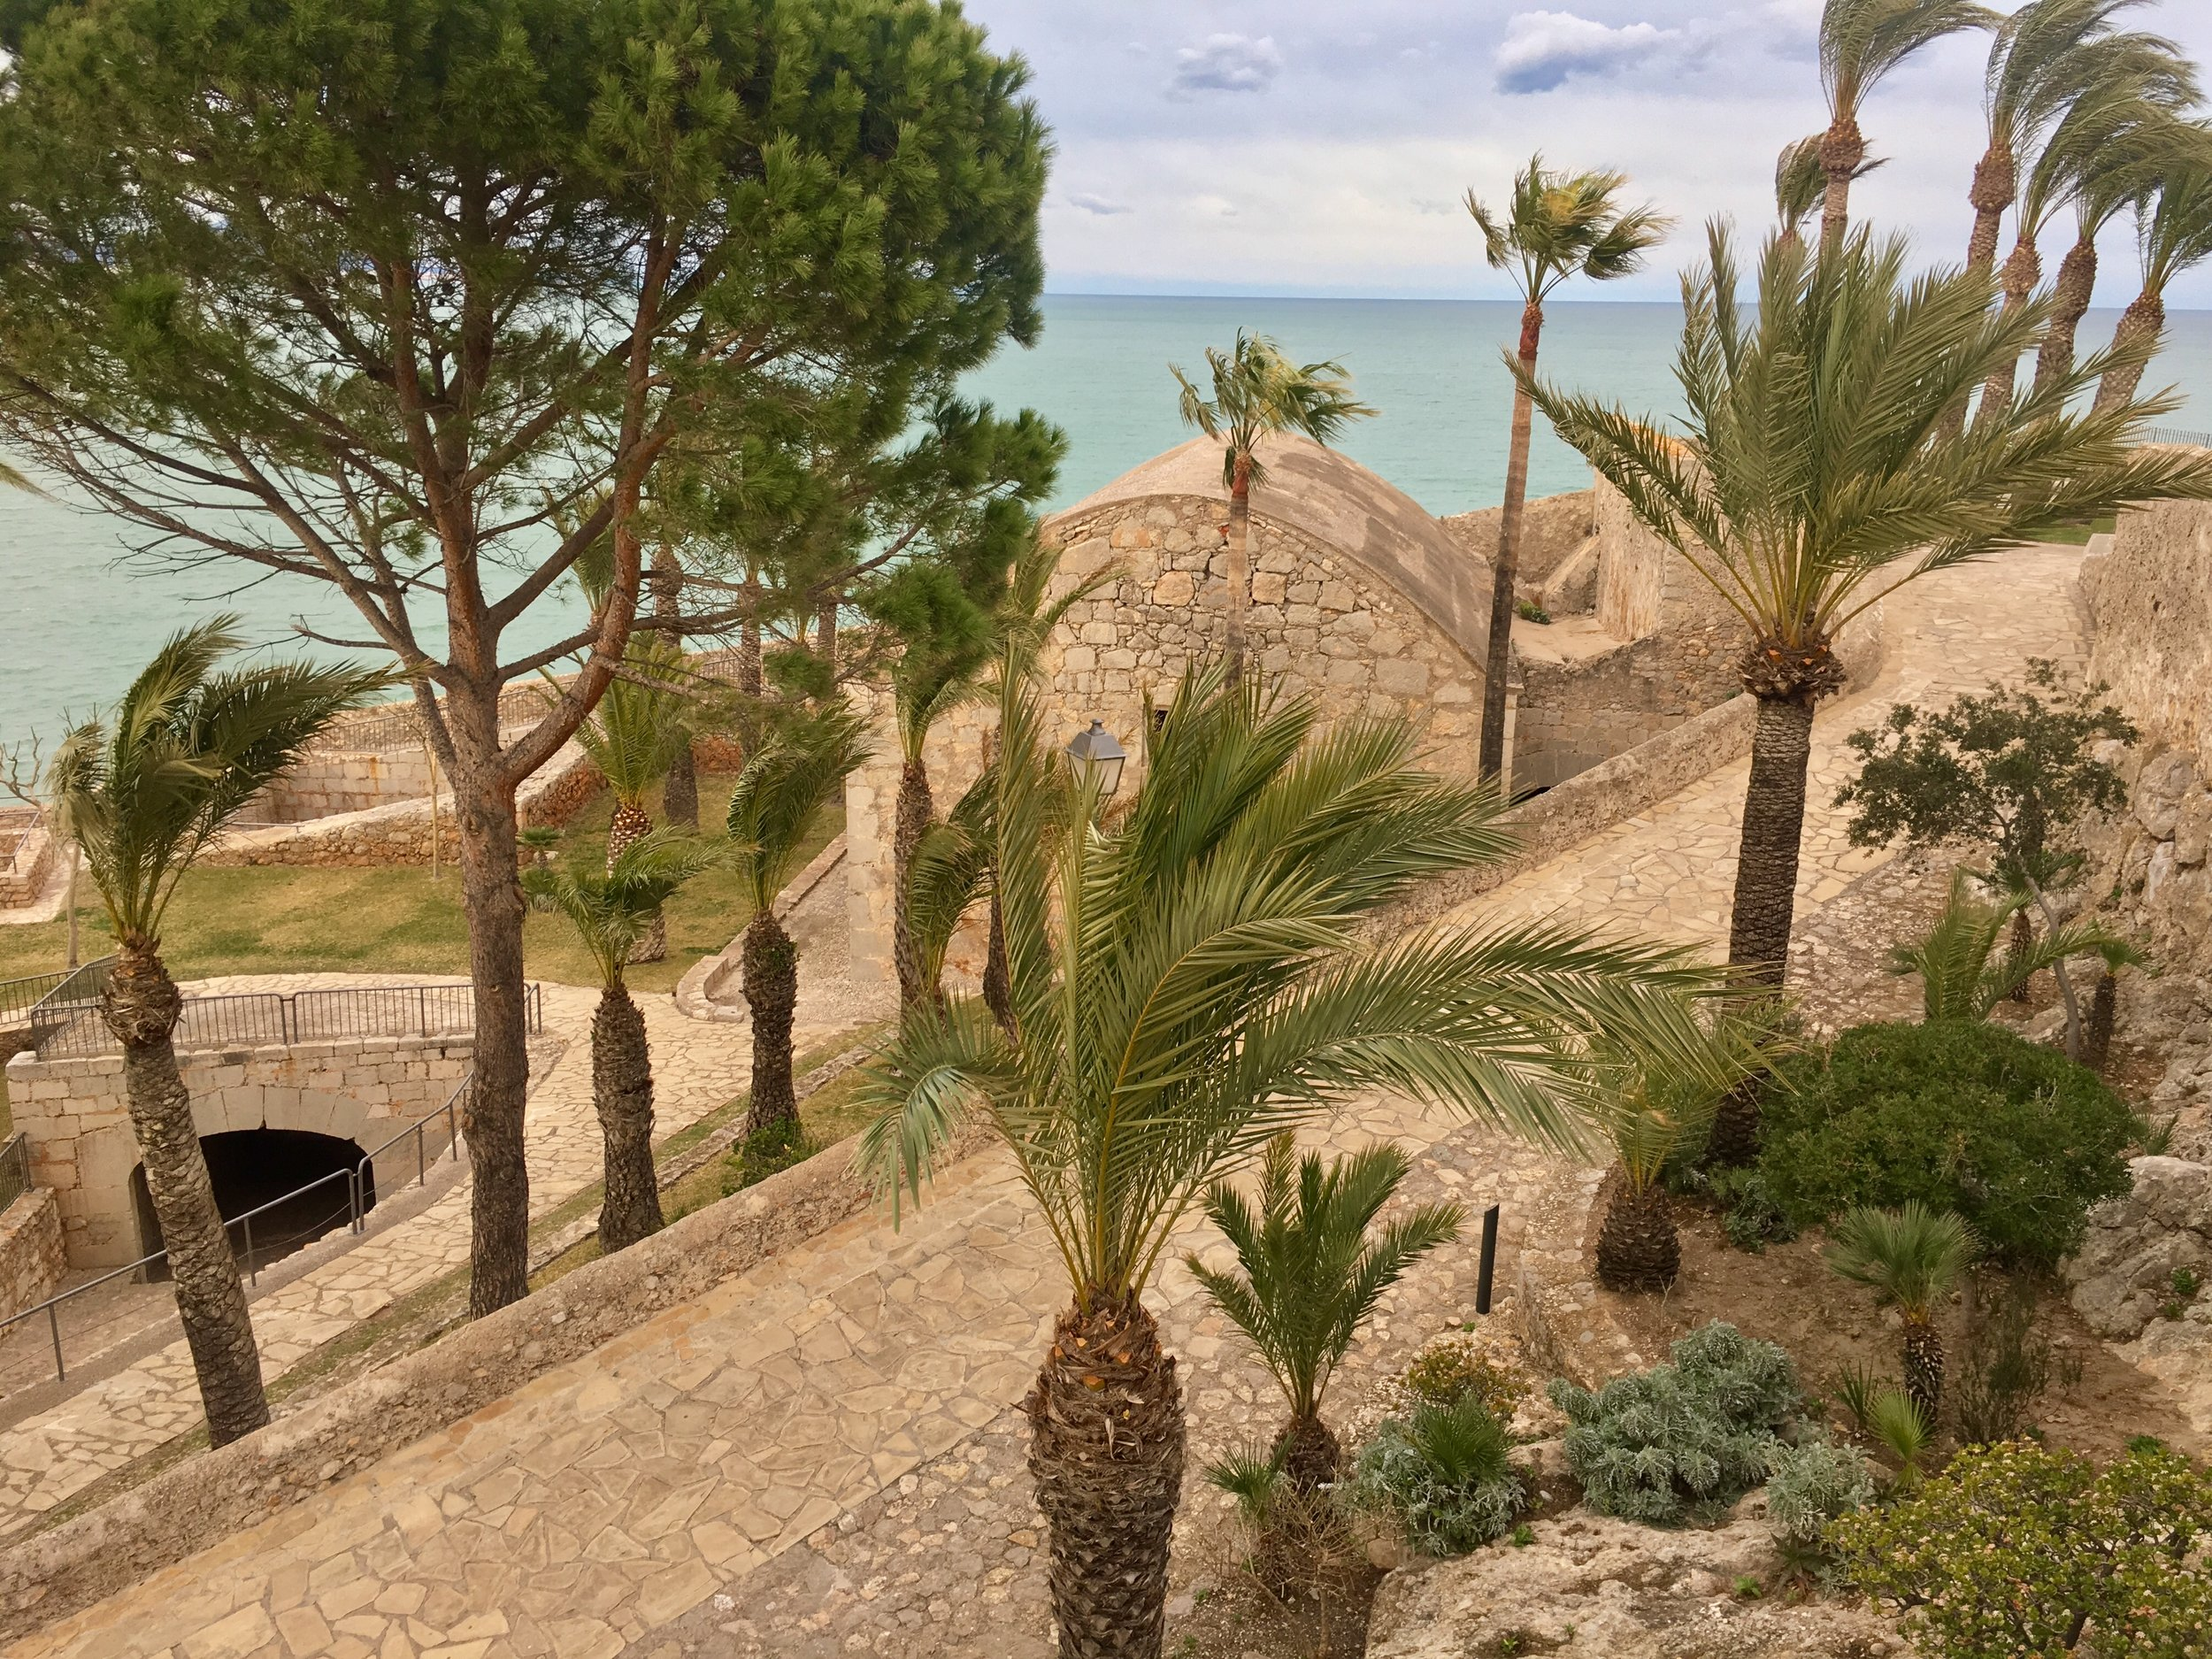 Overlooking the breezy palm trees in Parc d'Artilleria,Peñíscola's resident garden.